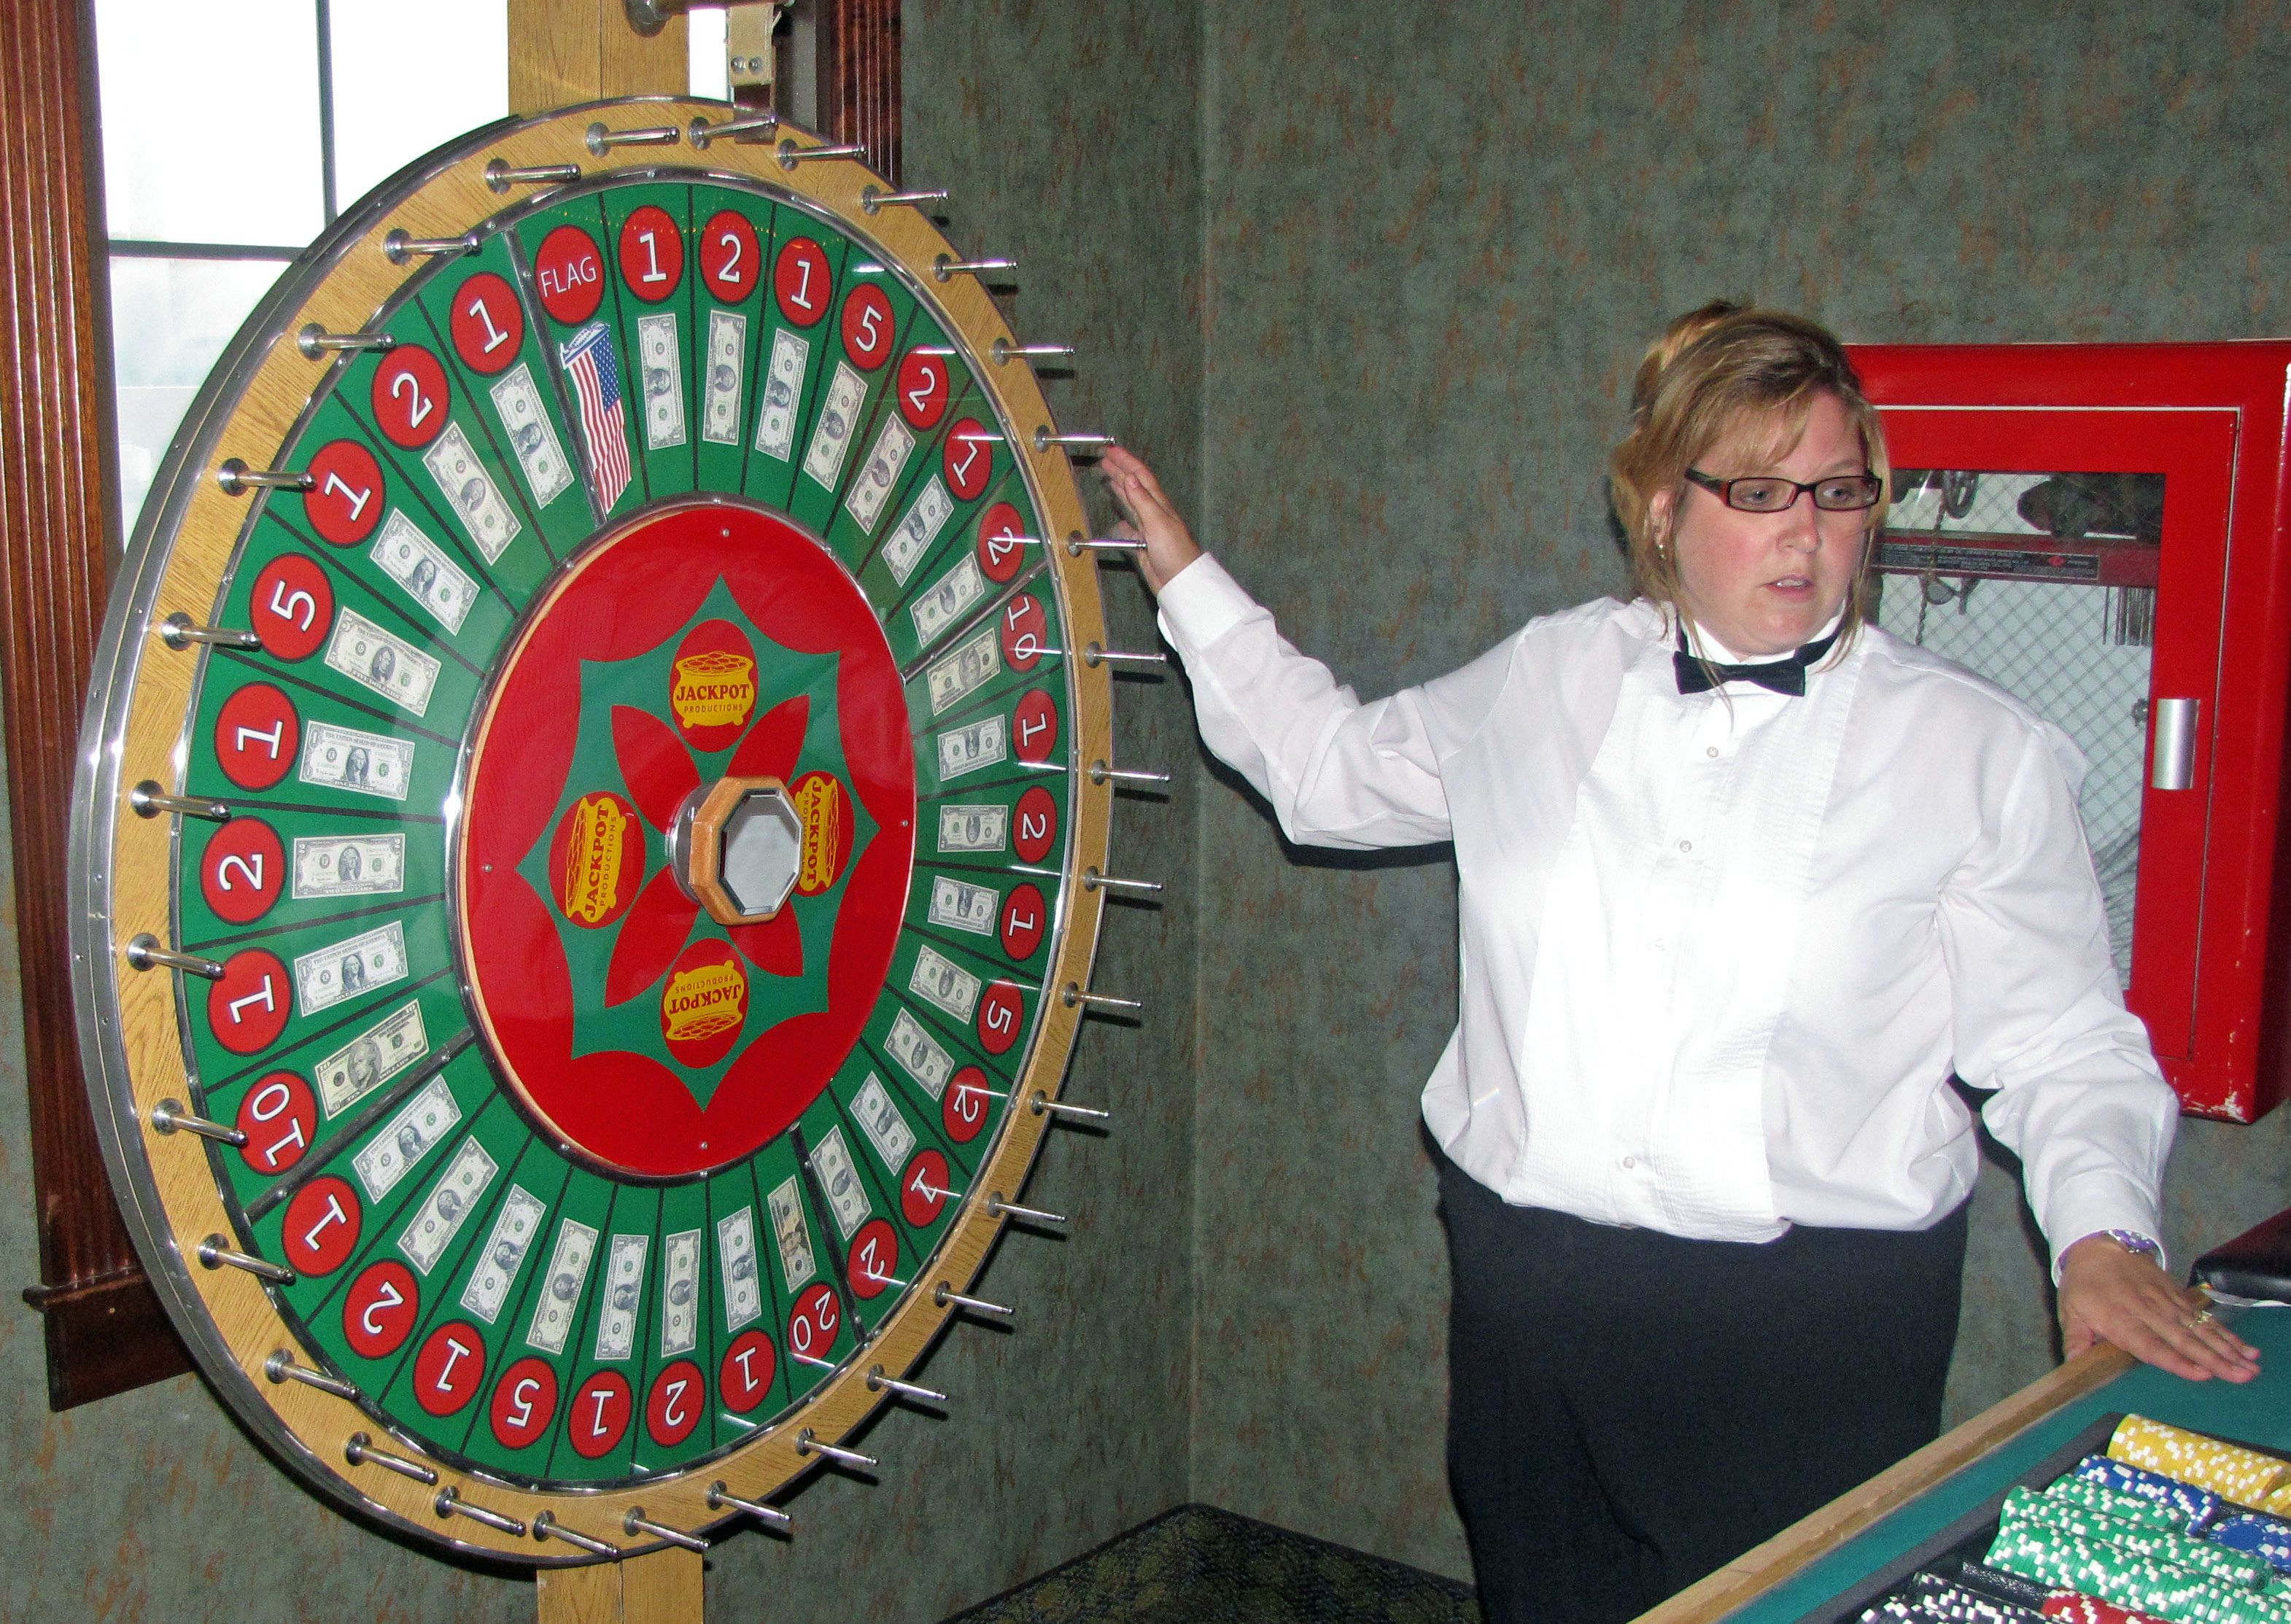 Wheel Game At Casino